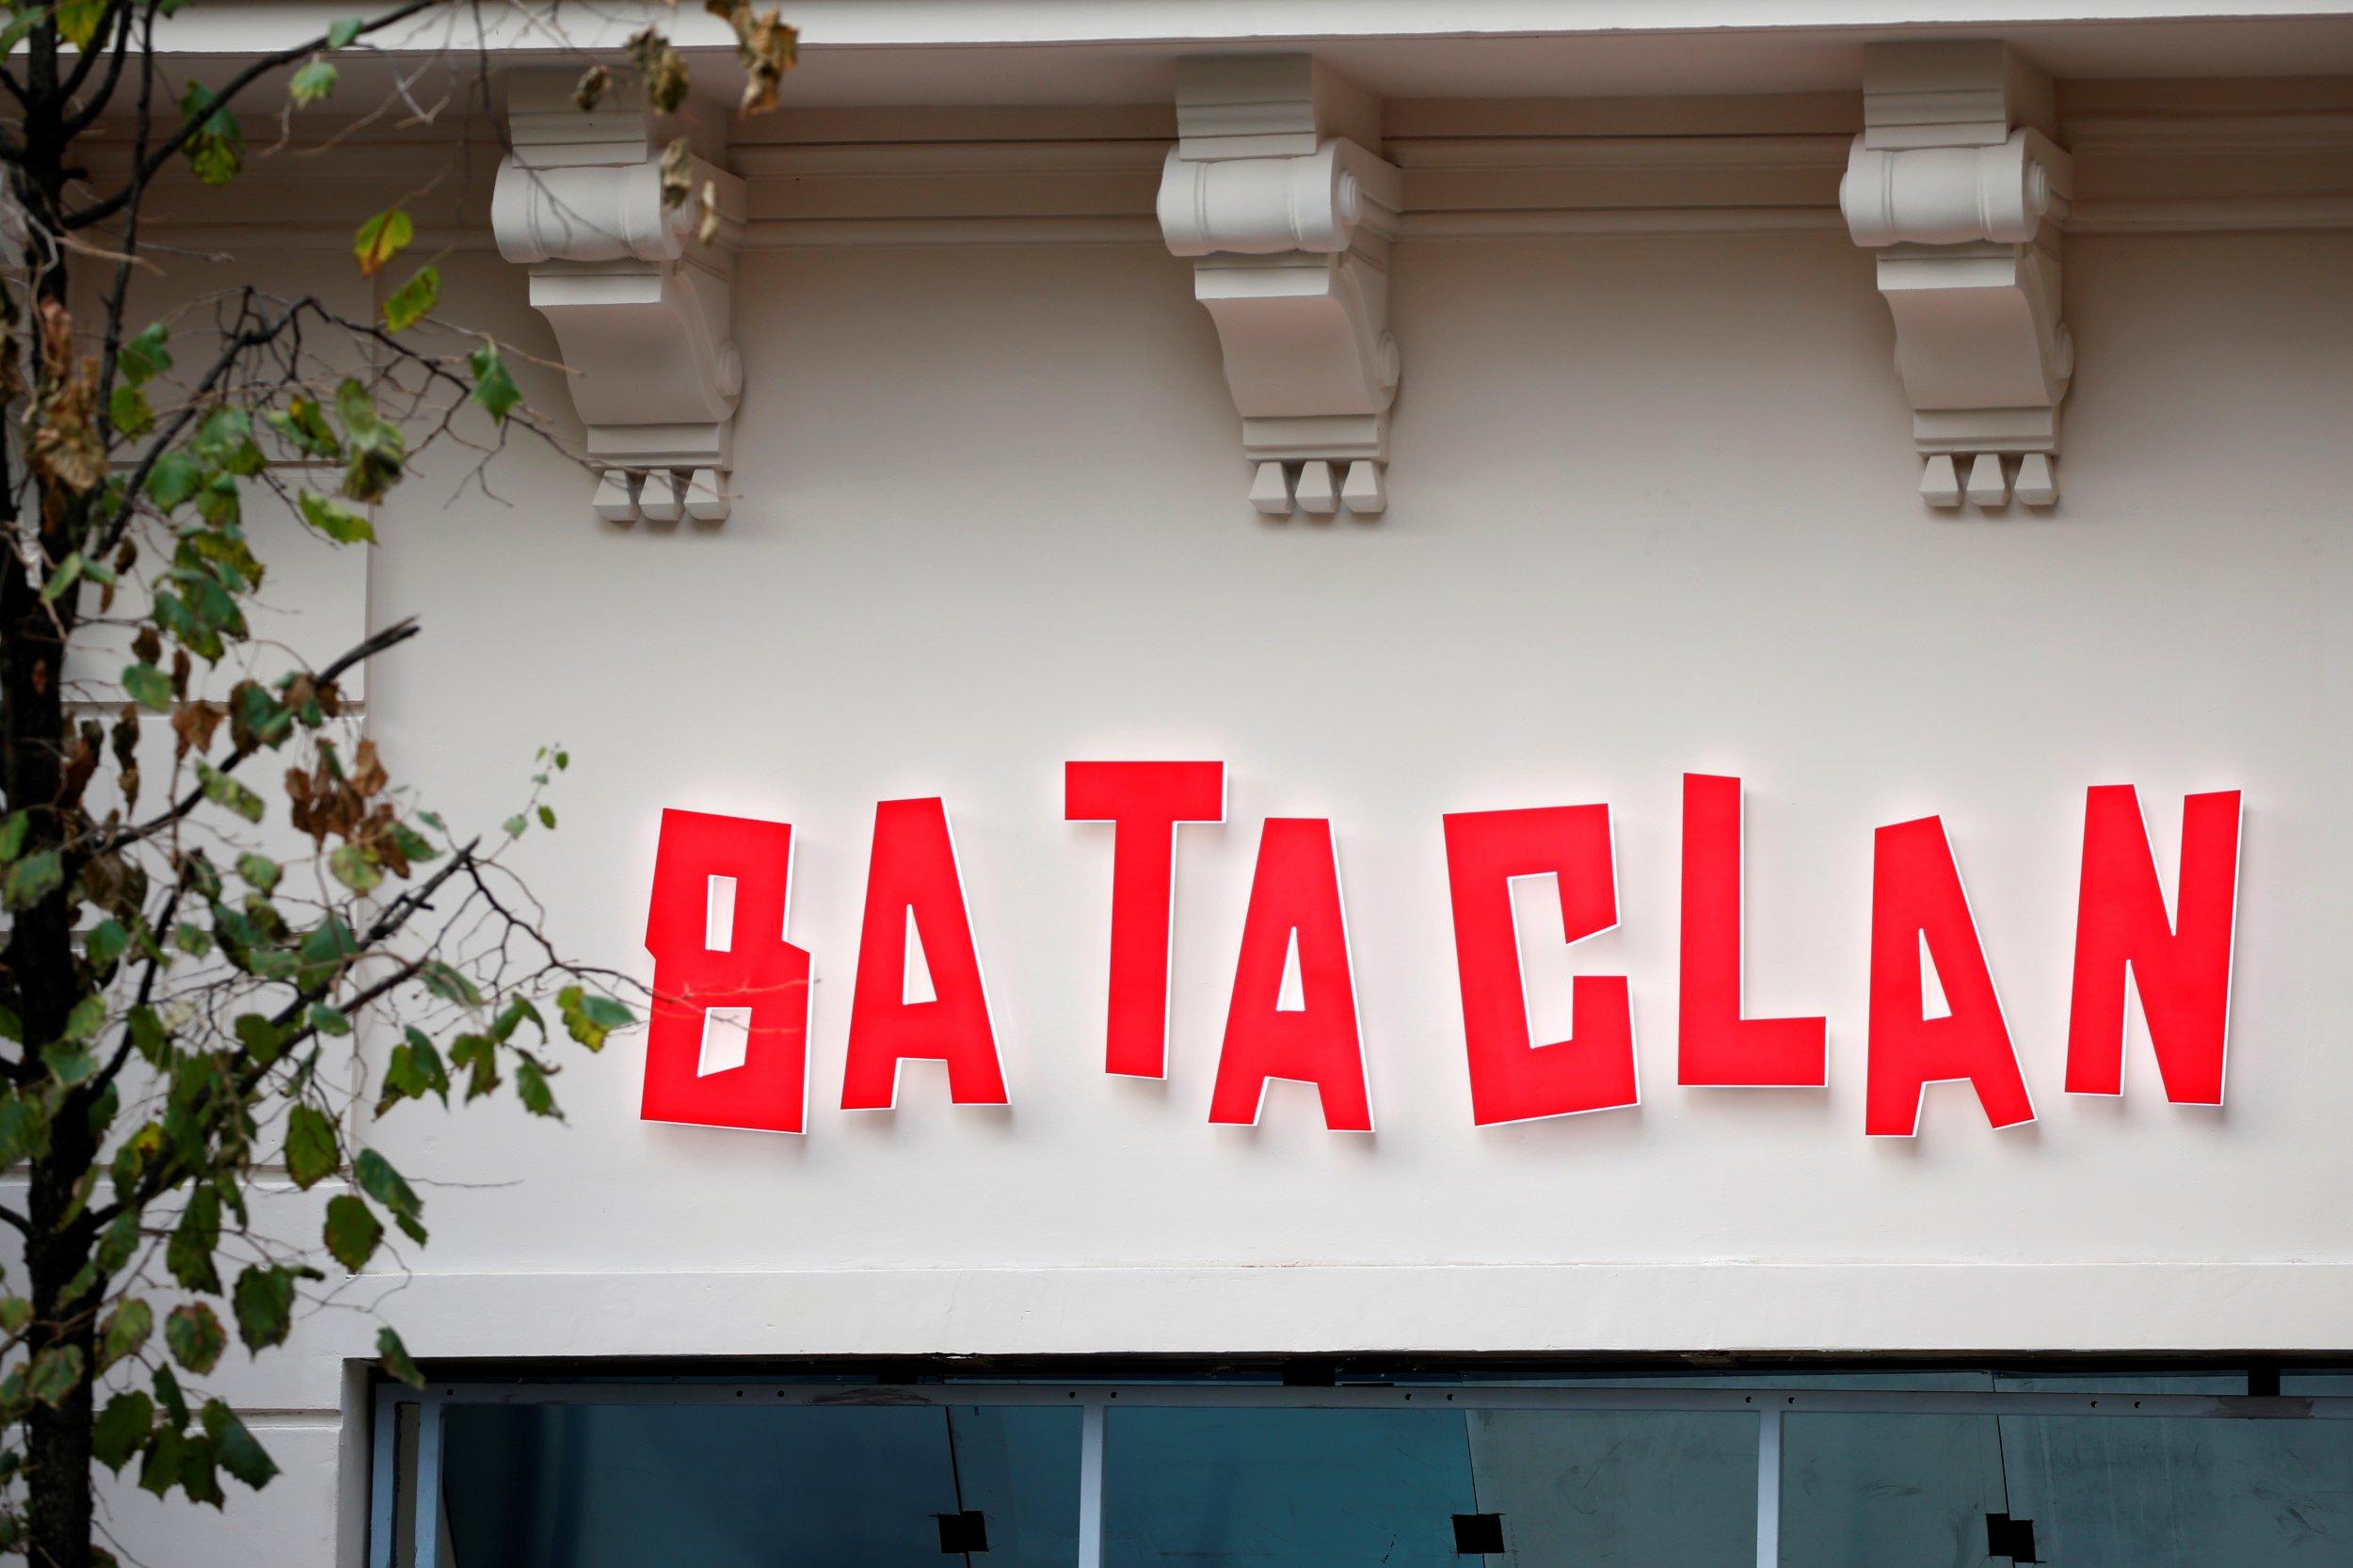 Bataclan concert hall